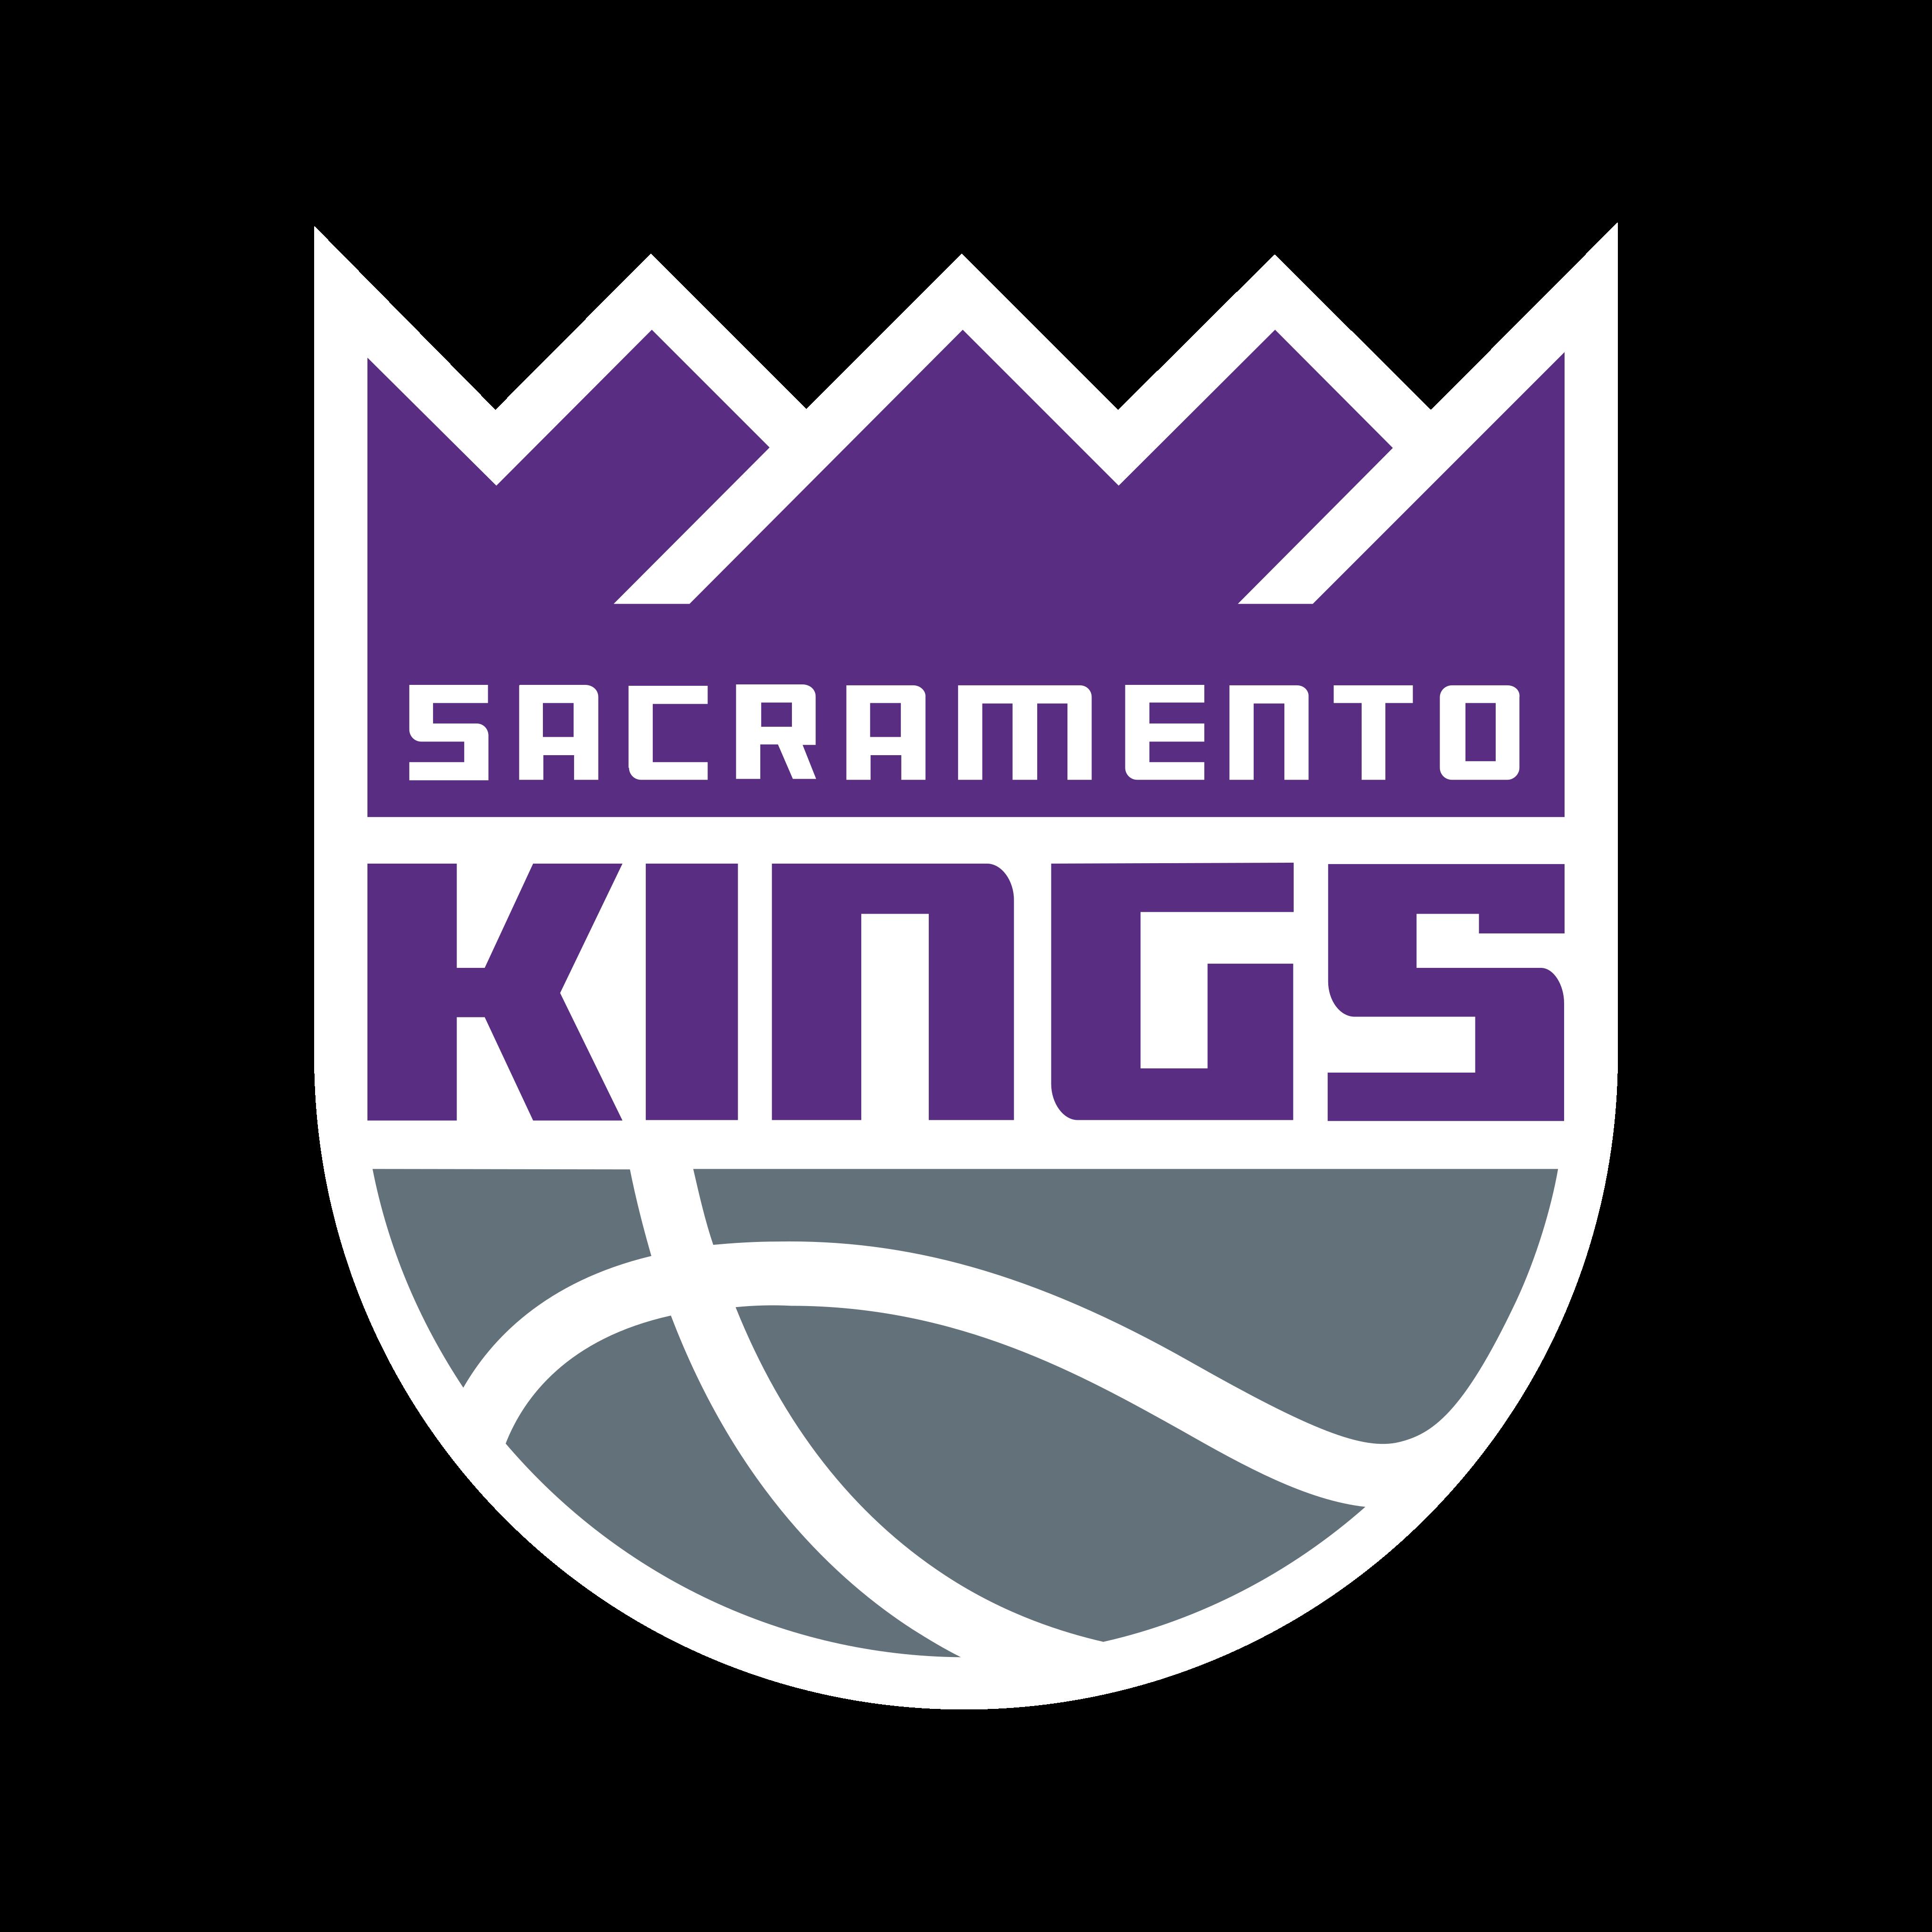 sacramento kings logo 0 - Sacramento Kings Logo